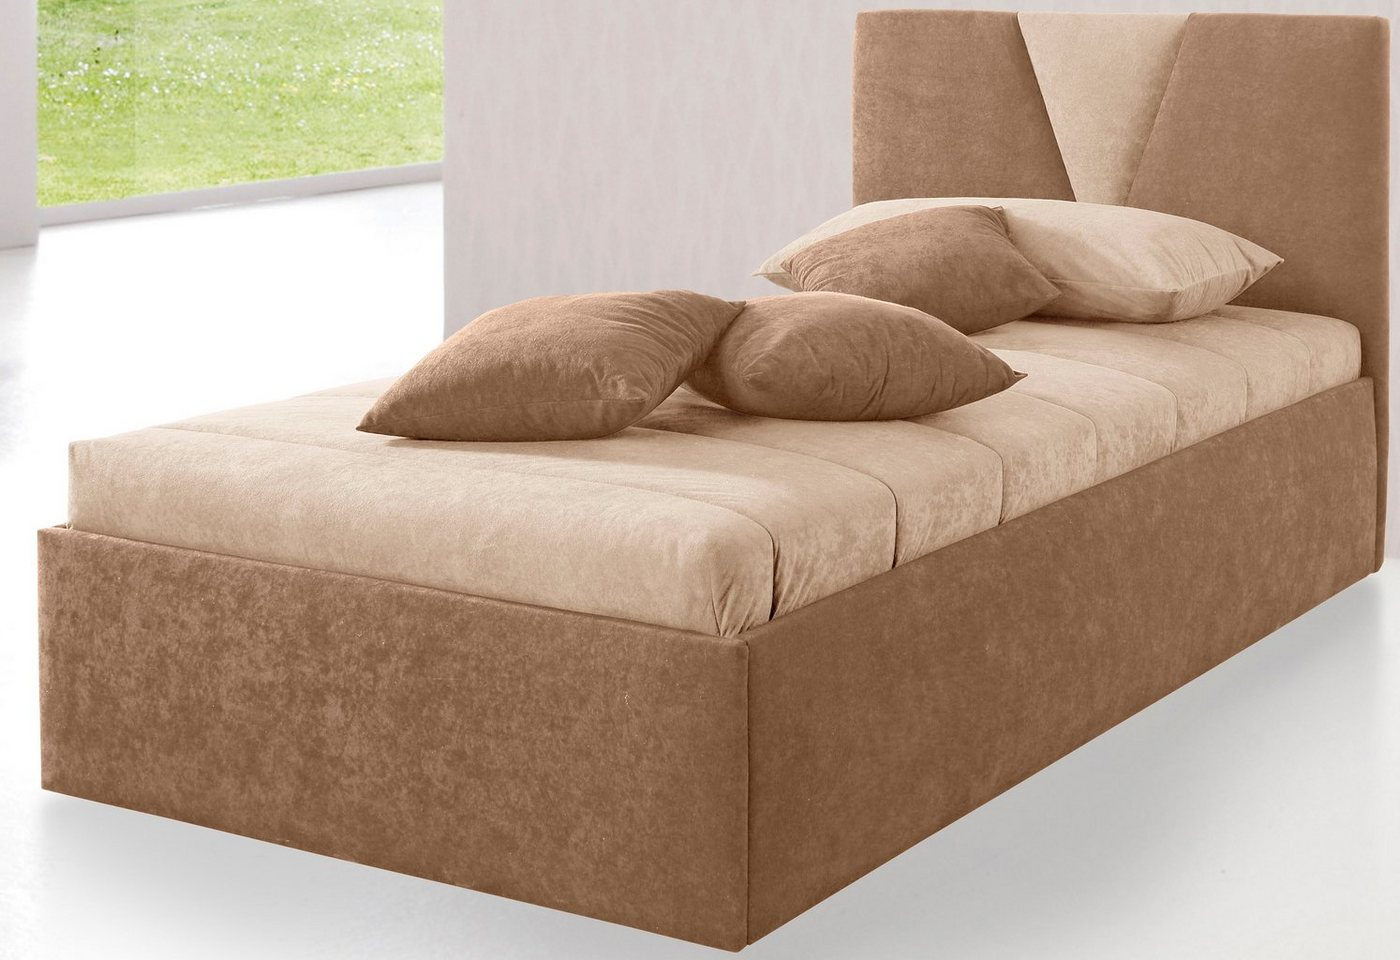 Westfalia Schlafkomfort Polsterbett »Malibu«, wahlweise mit Bettkasten, in 2 Höhen, Microveloursbezug